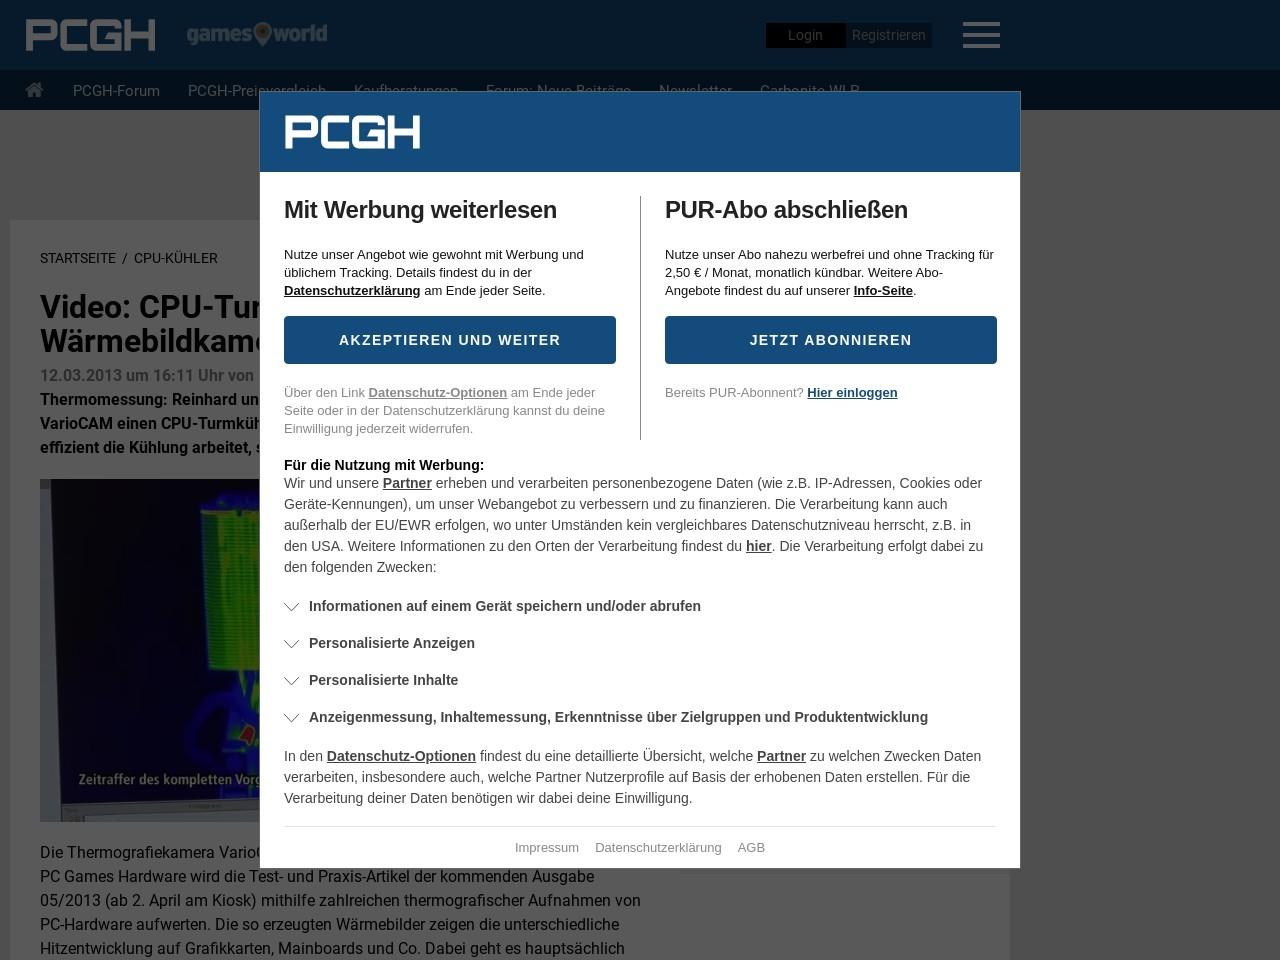 Video: CPU-Turmkühler per Wärmebildkamera geprüft